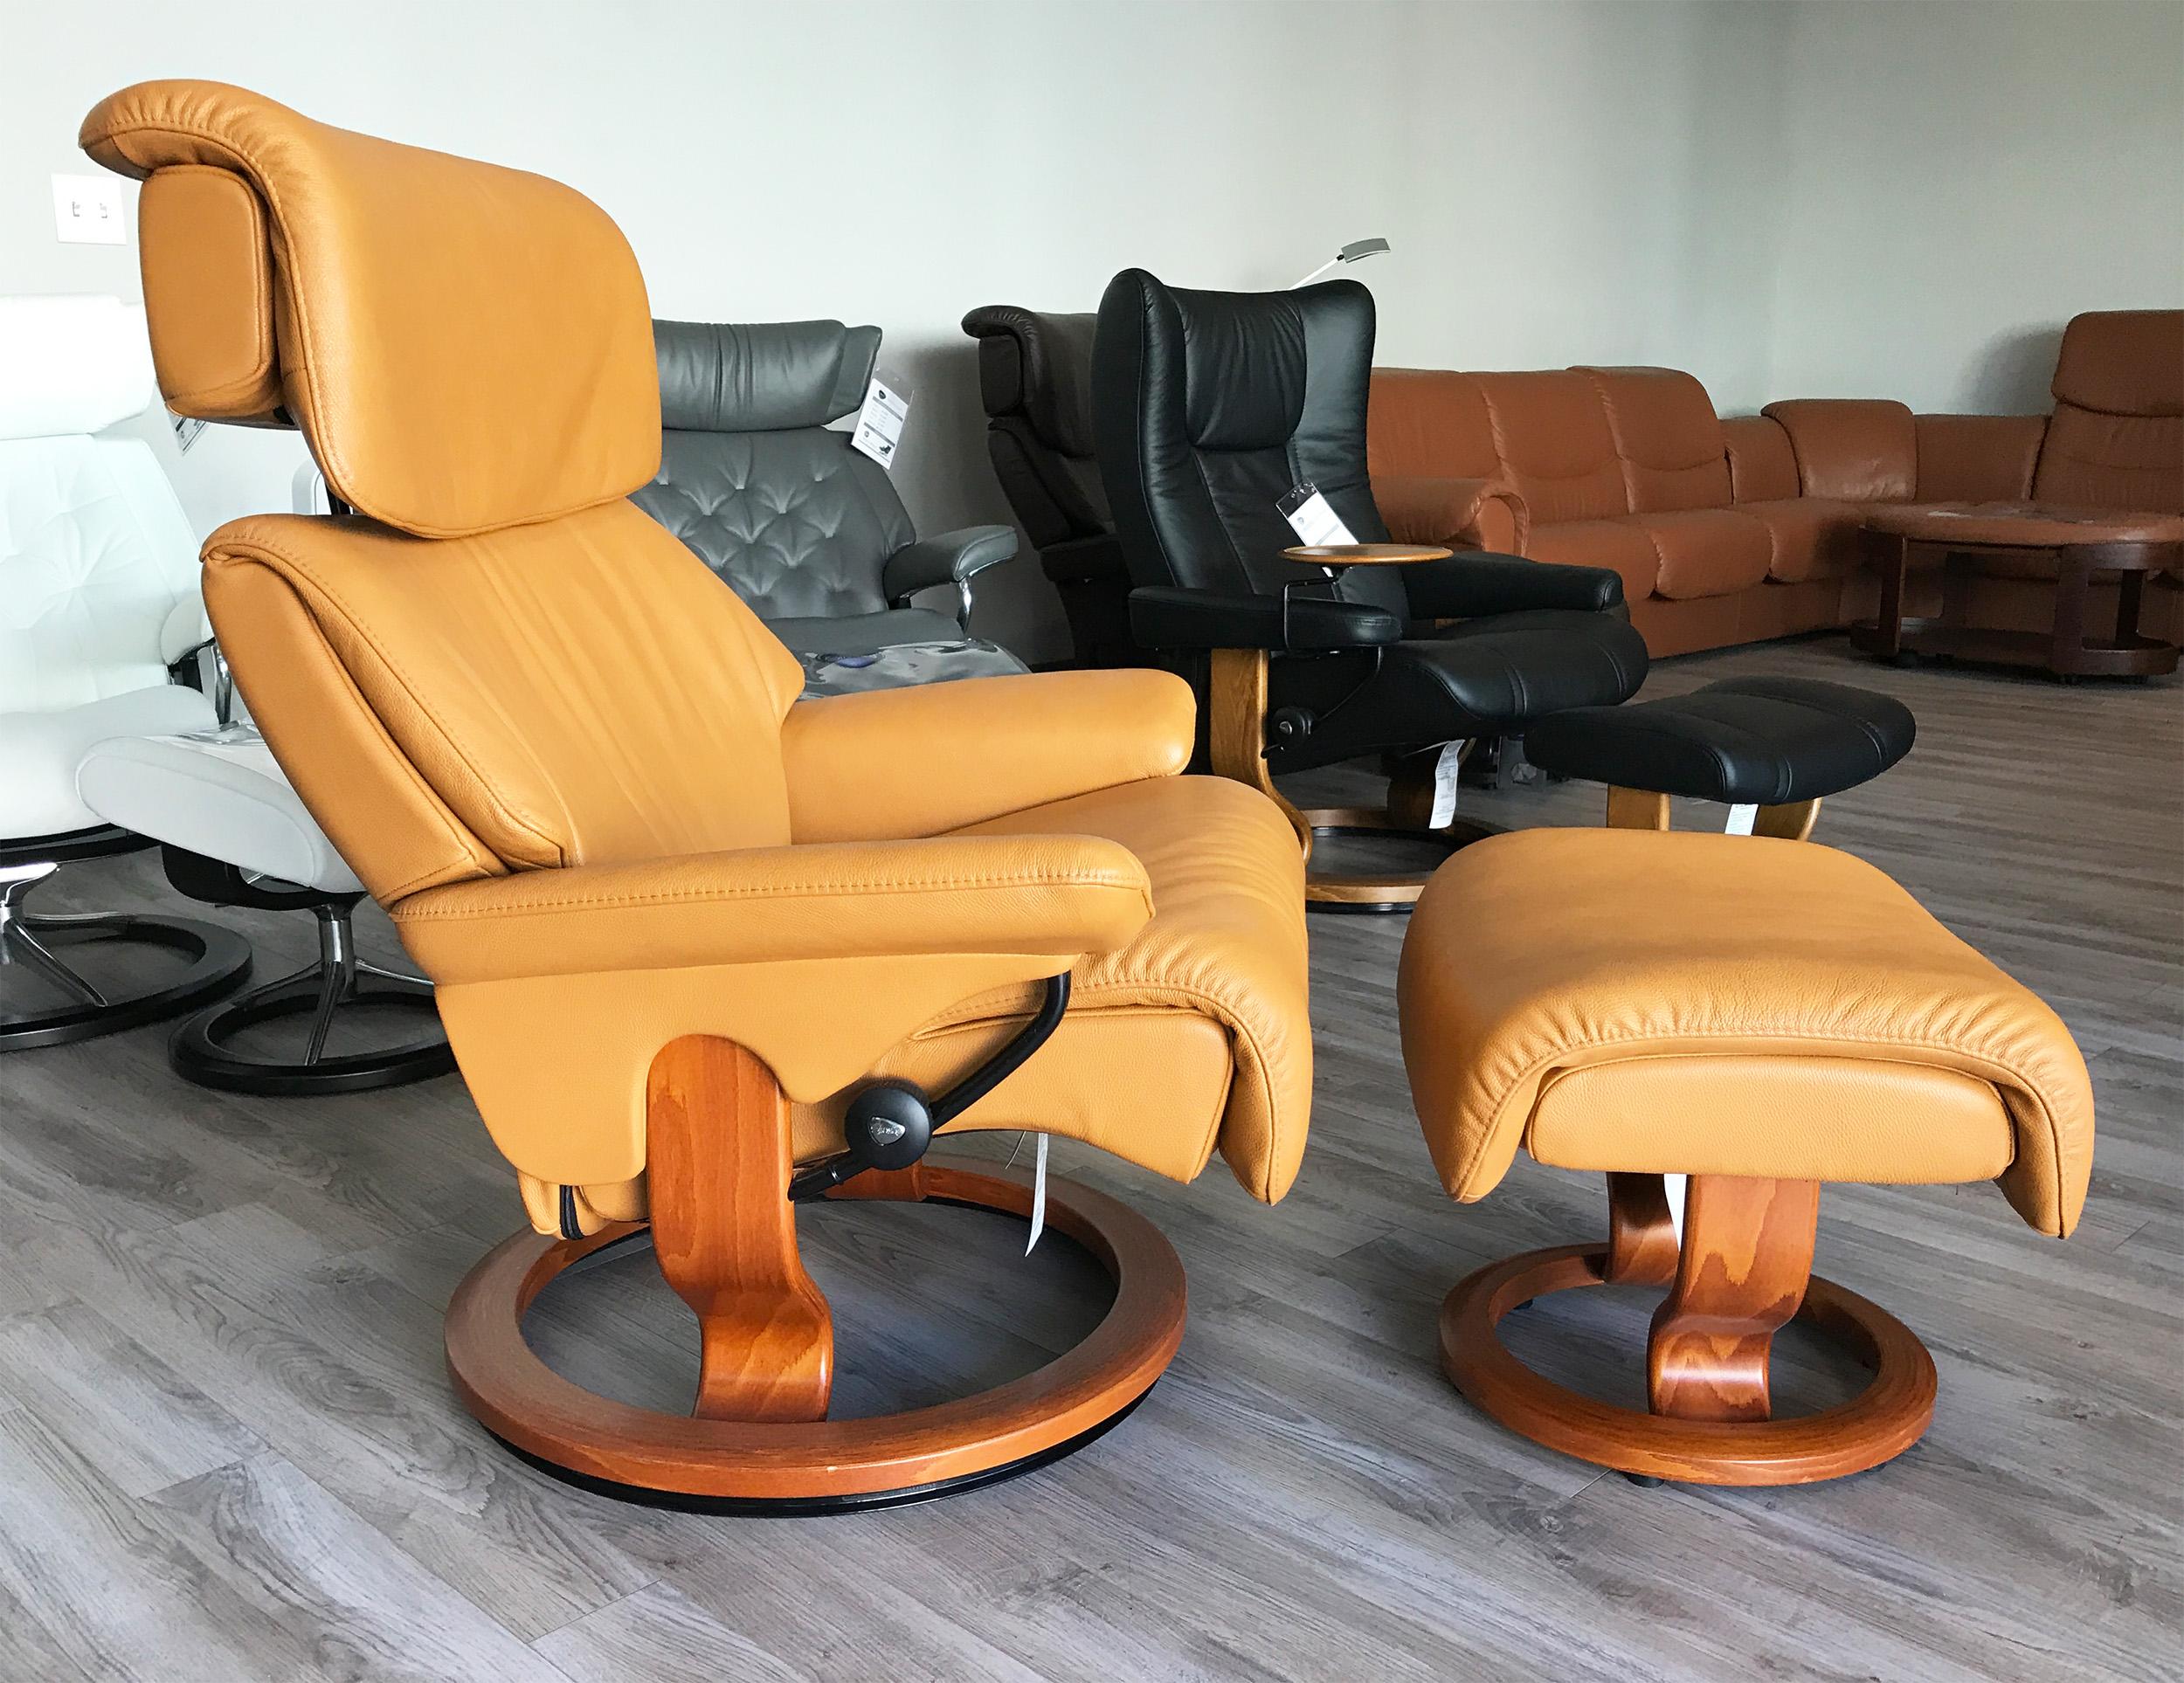 Stressless Spirit Dream Cori Tan Leather Recliner Chair and